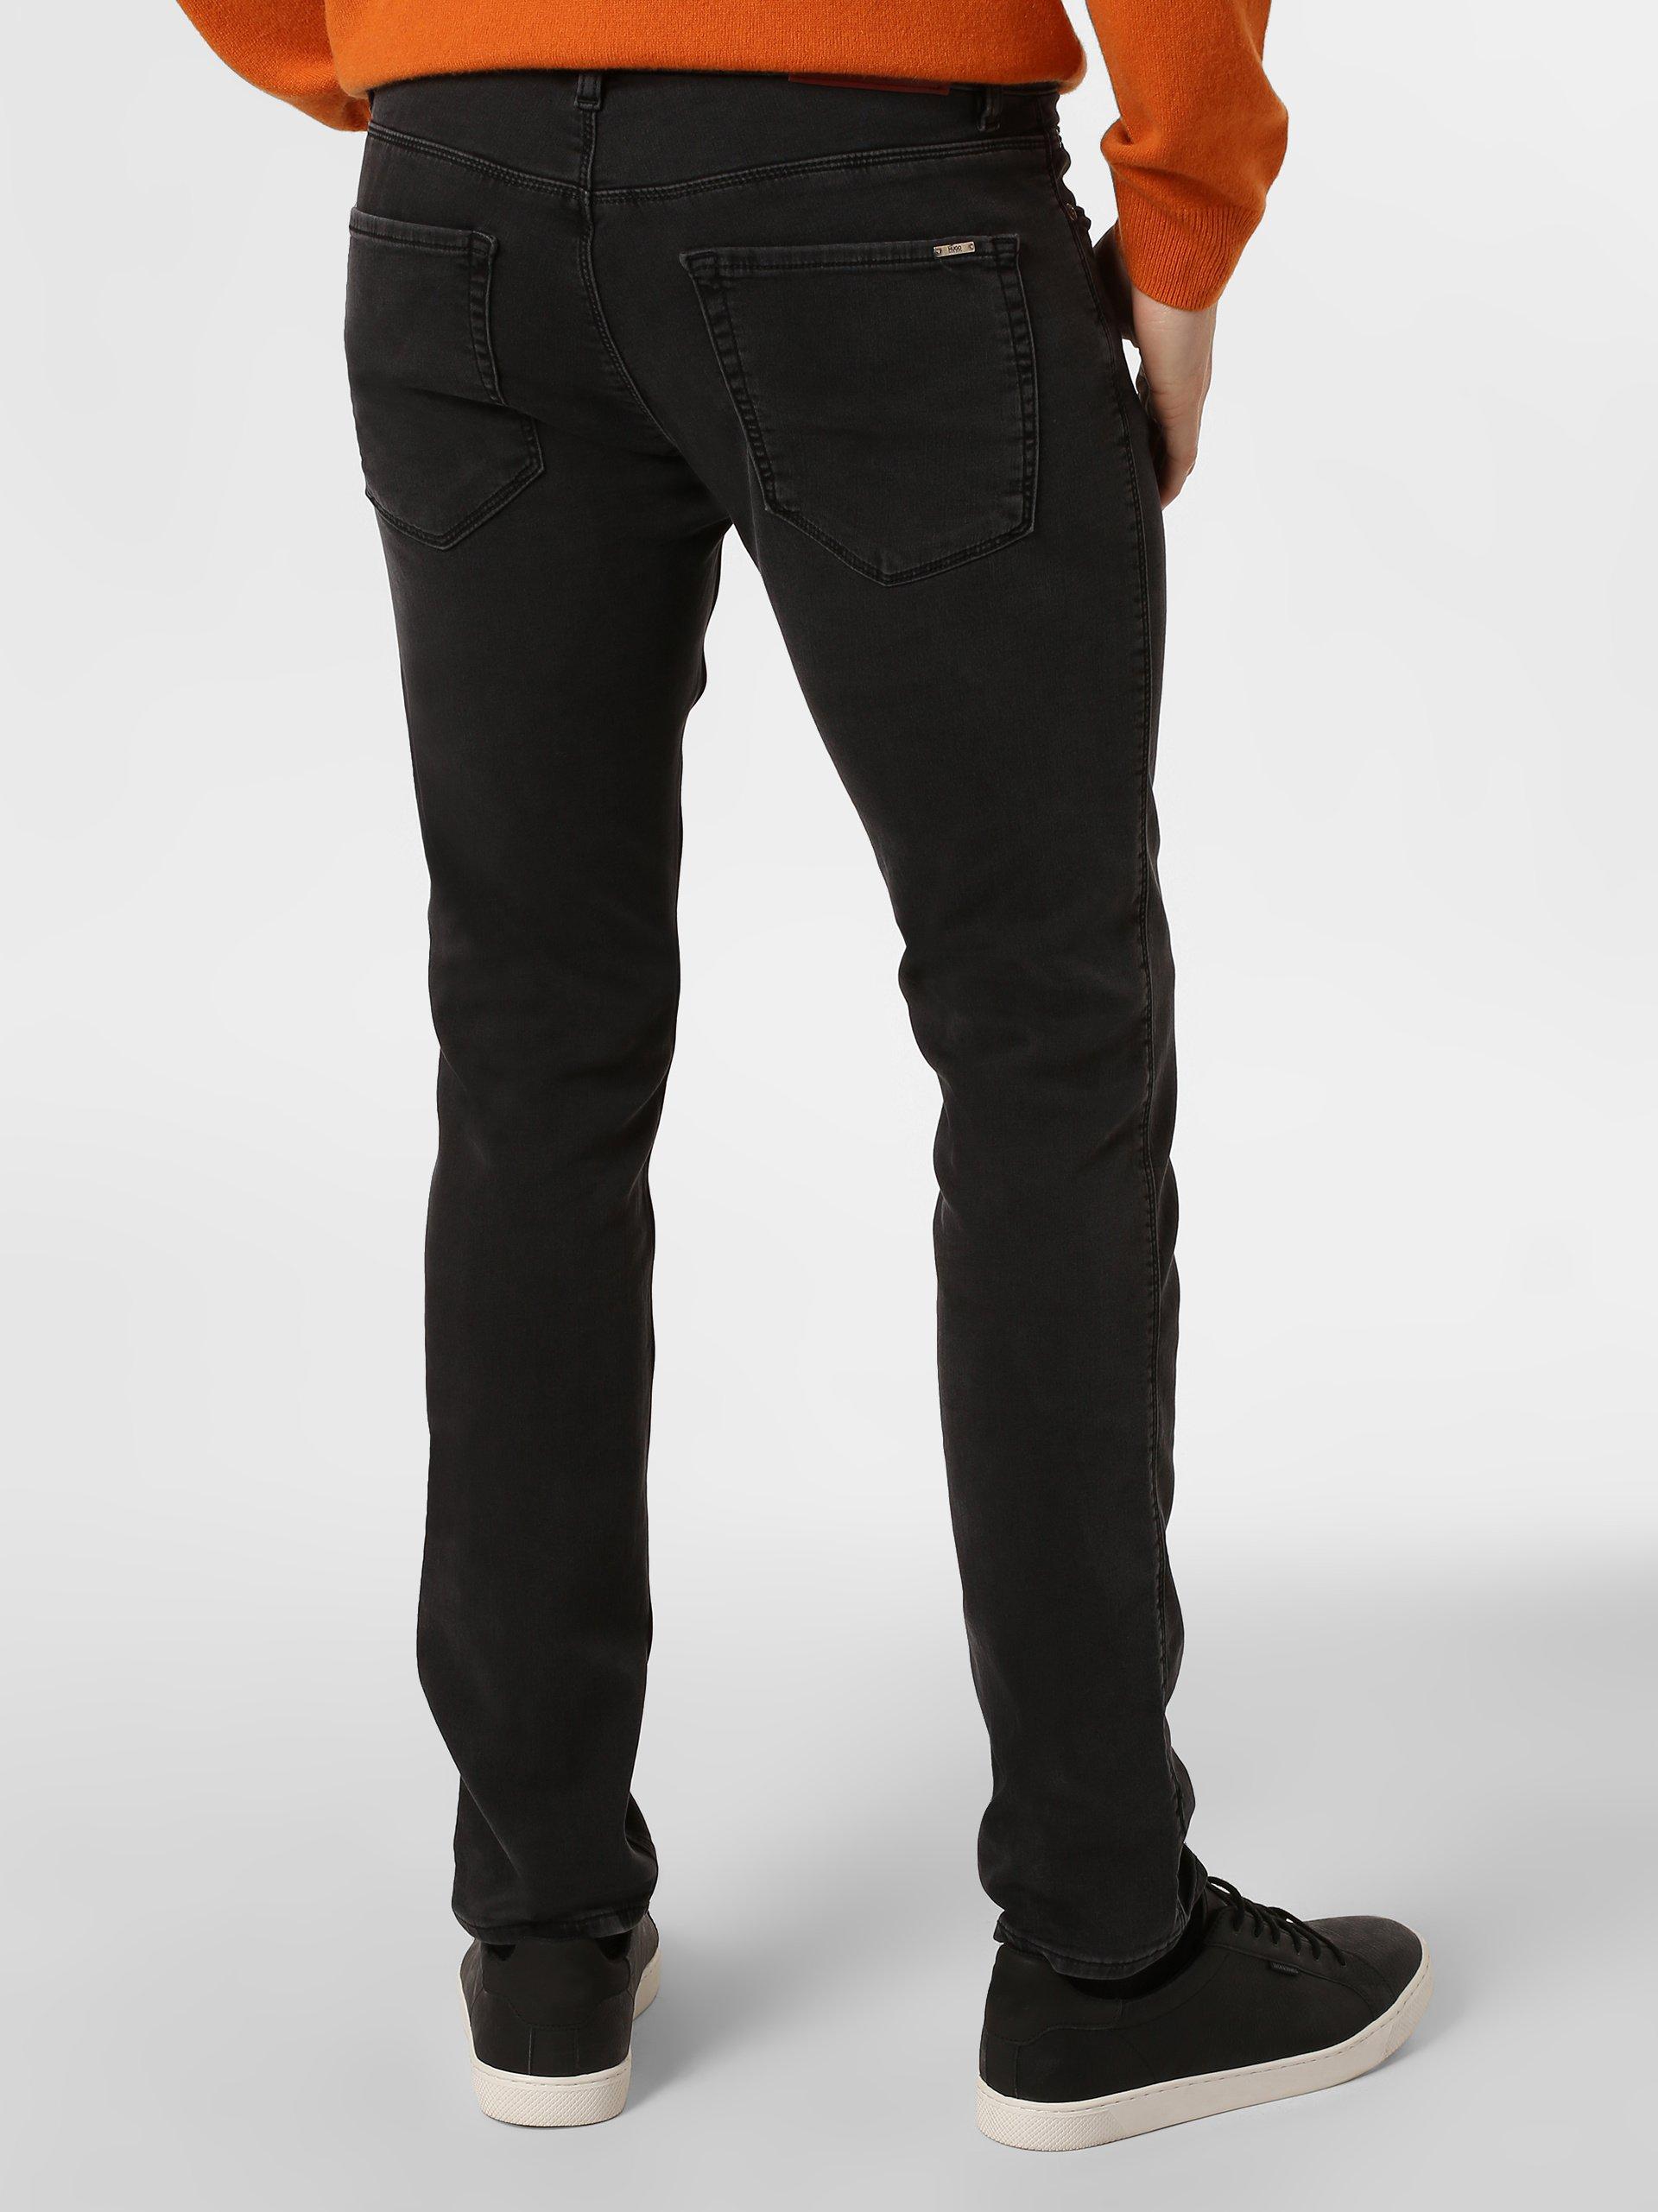 HUGO Herren Jeans - Hugo 734